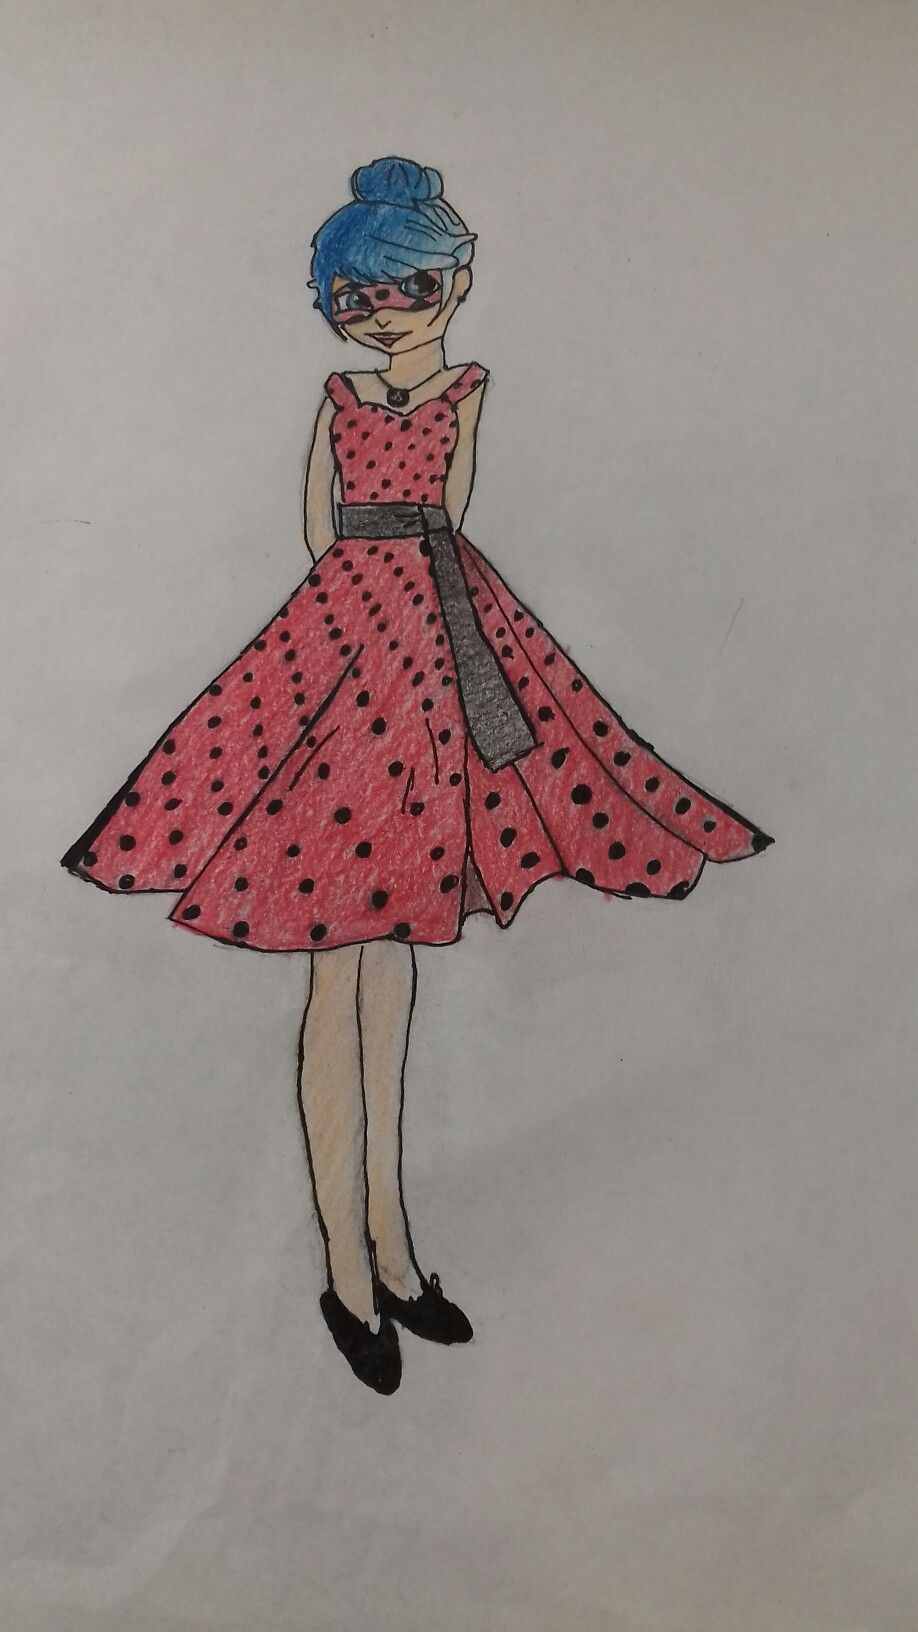 890f1b31a Marinette con vestido de gala poe Itzel Cardoso